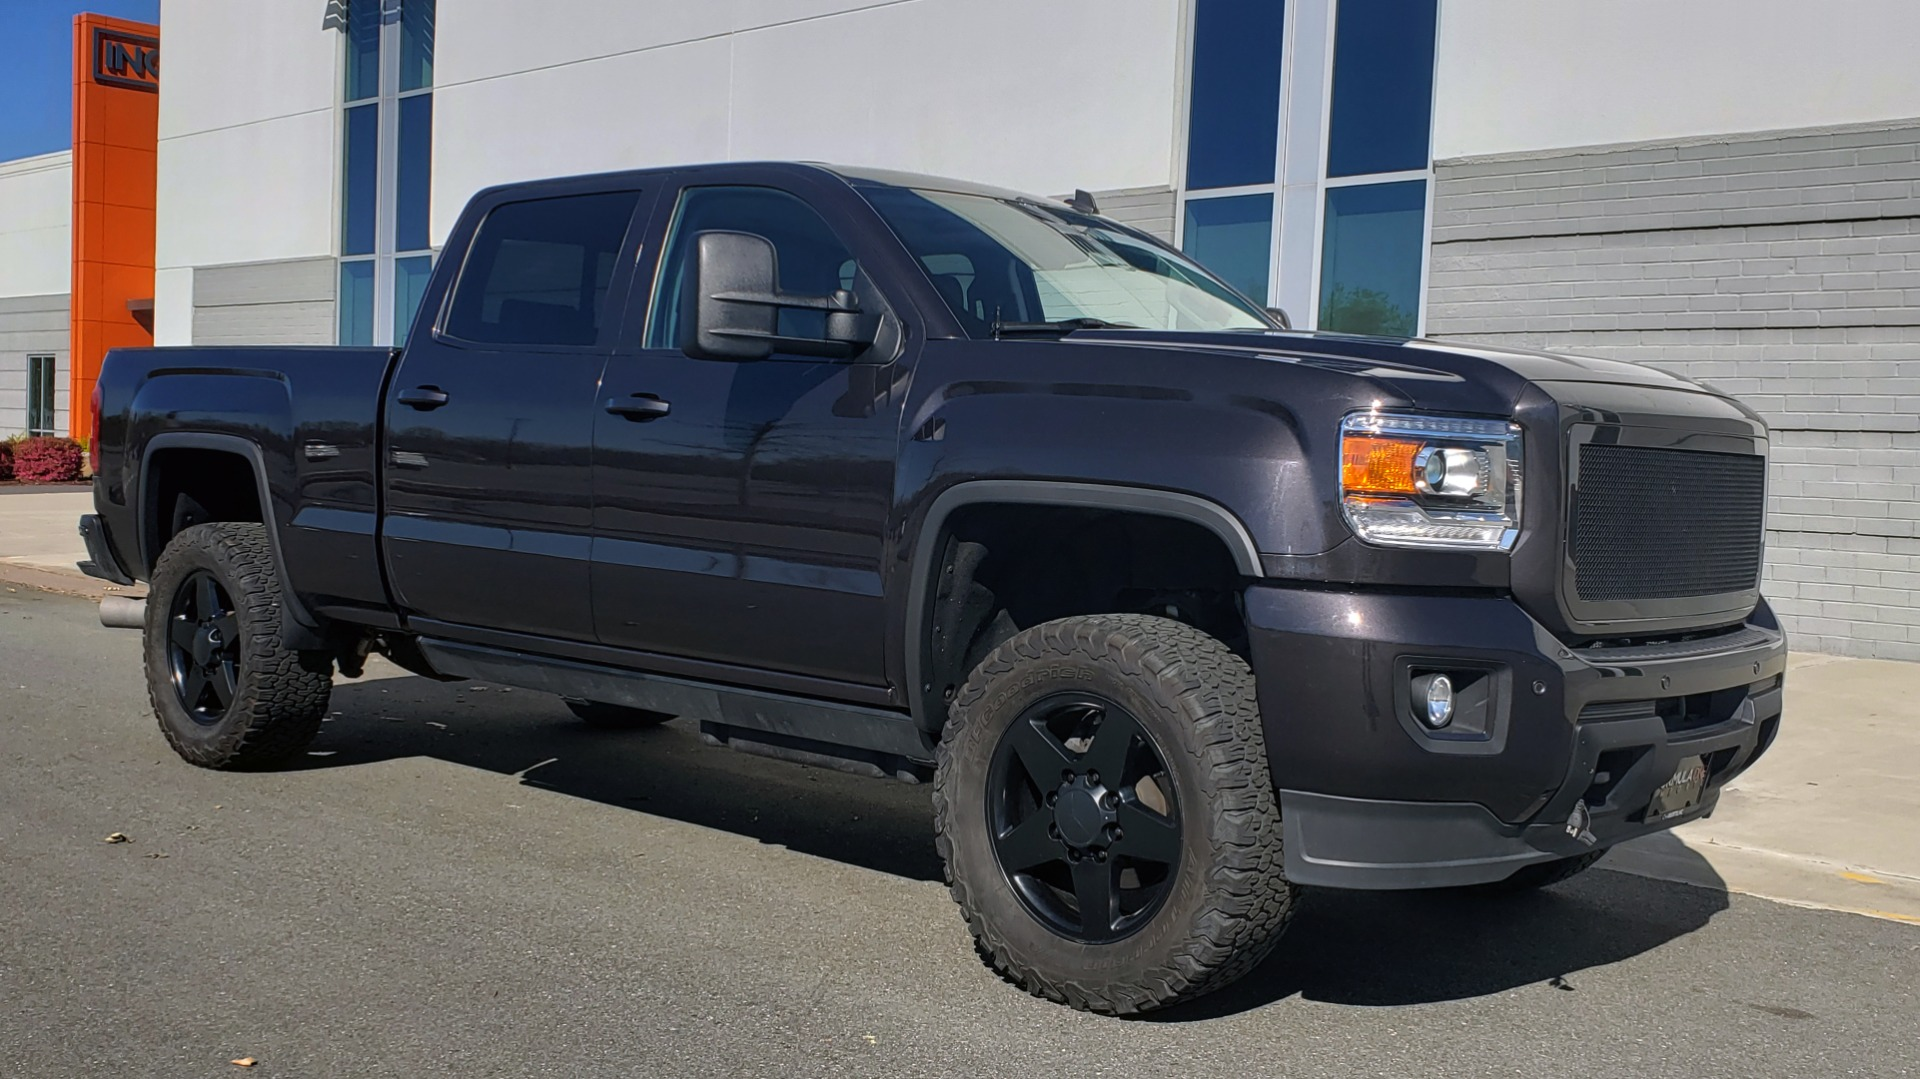 Used 2015 GMC SIERRA 2500HD DENALI 4WD CREWCAB / 6.6L DURAMAX / 6-SPD AUTO / NAV / BOSE for sale $50,995 at Formula Imports in Charlotte NC 28227 5